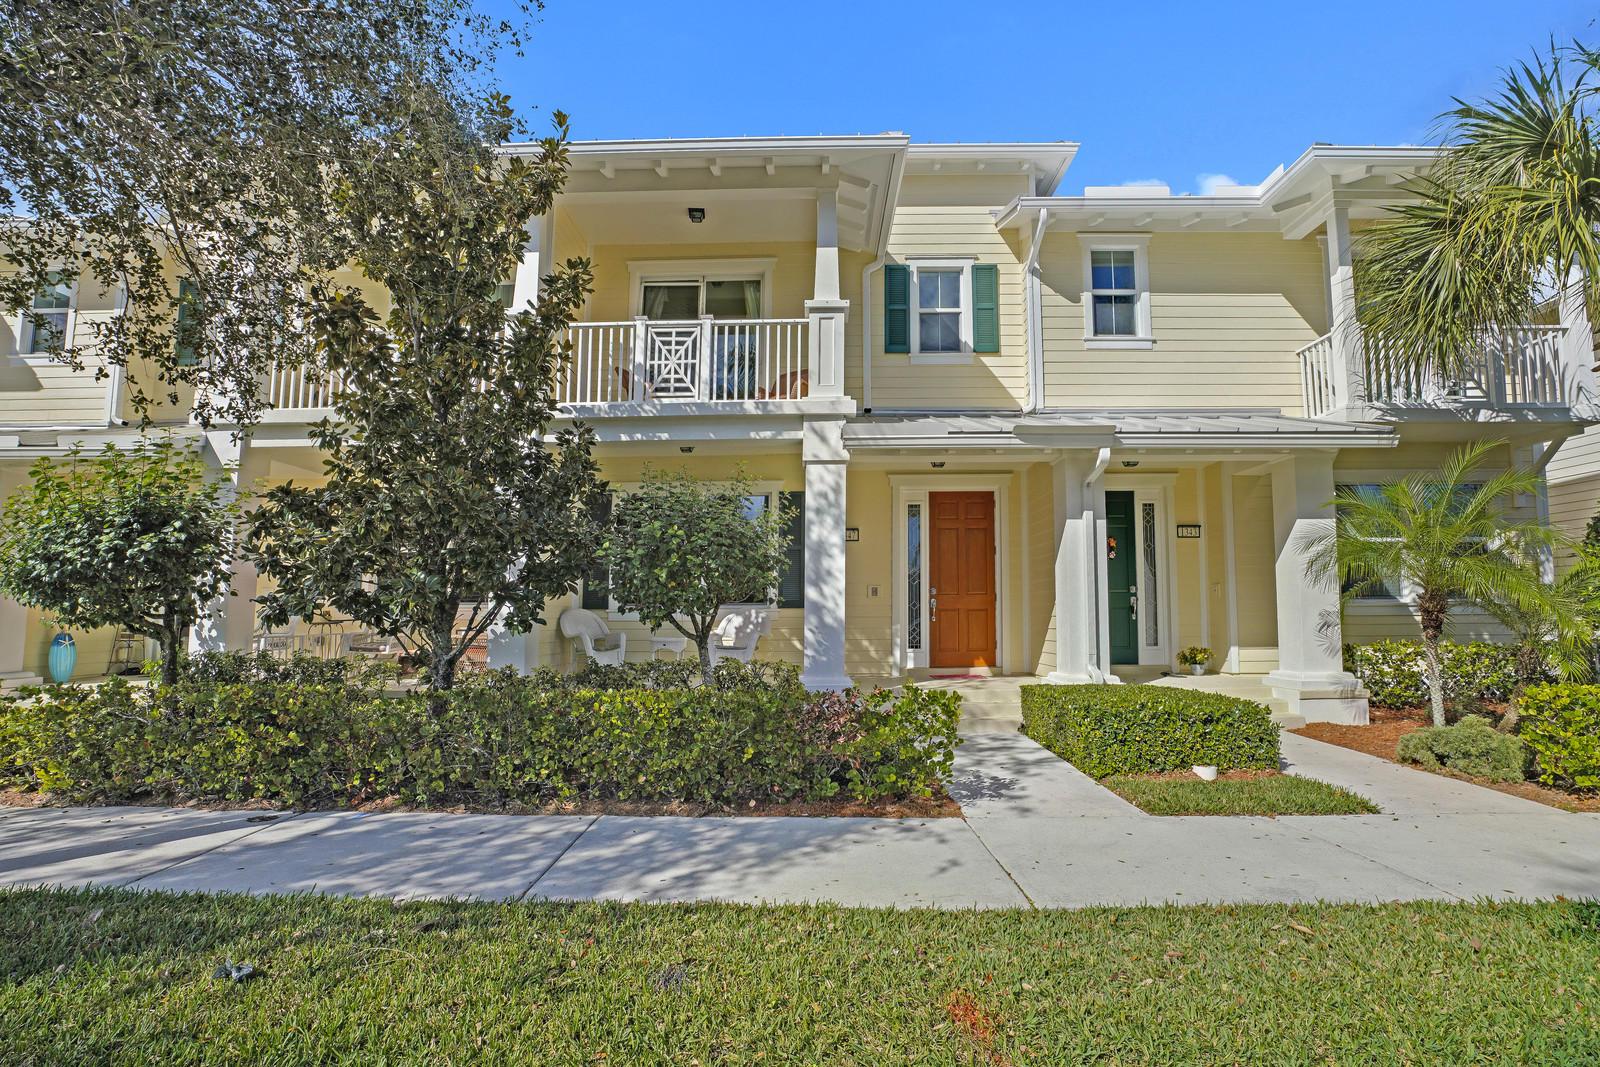 1347 Jeaga Drive, Jupiter, Florida 33458, 3 Bedrooms Bedrooms, ,2.1 BathroomsBathrooms,A,Townhouse,Jeaga,RX-10488451